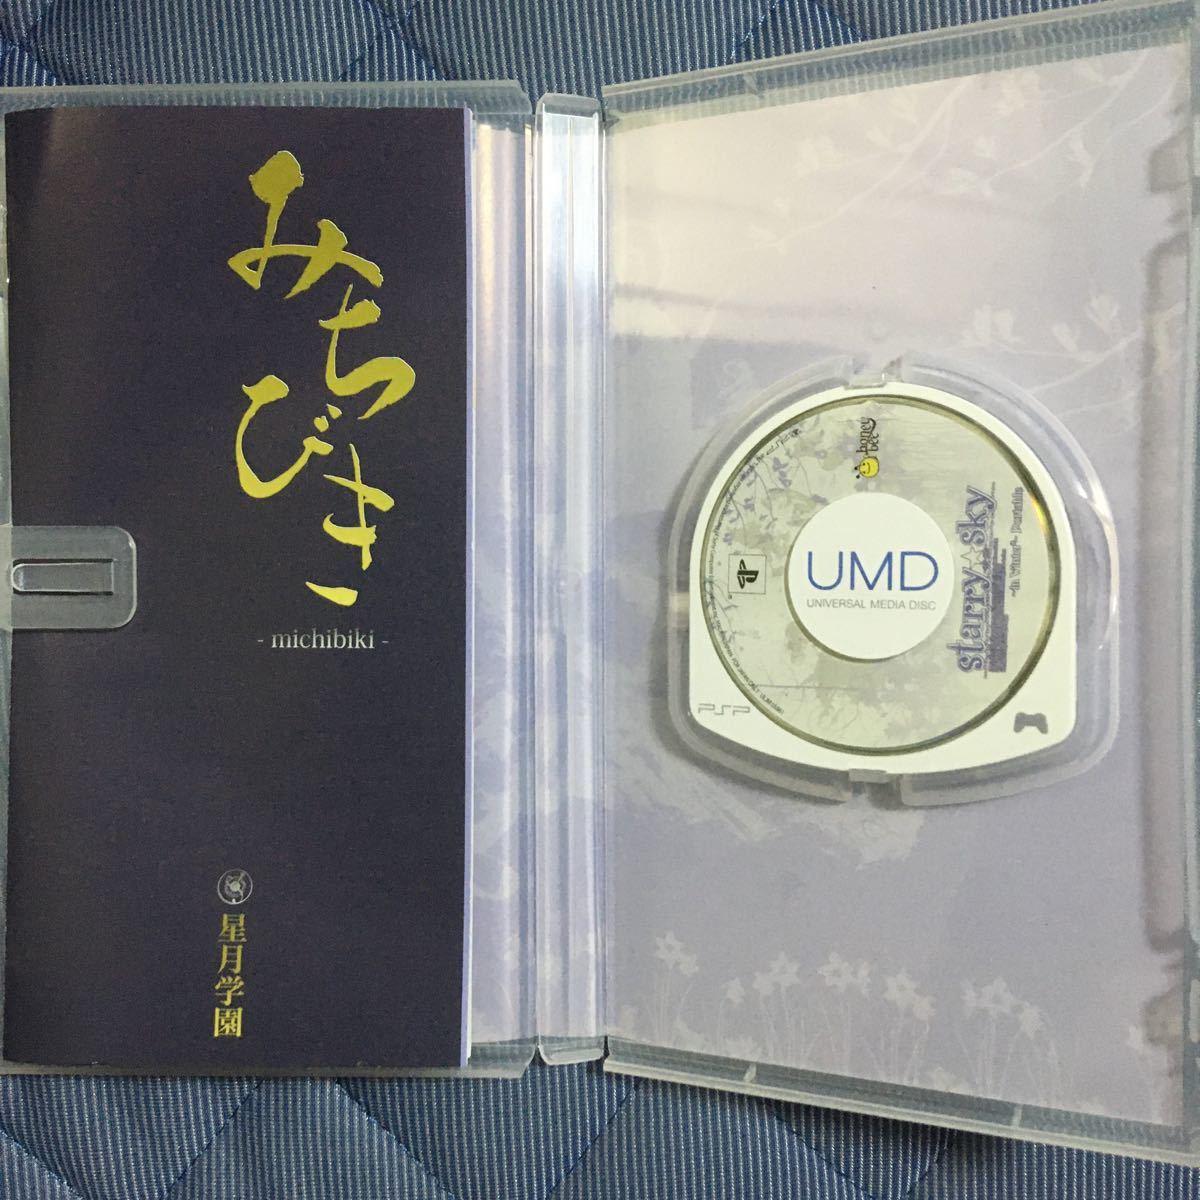 【PSP】Starry sky PSP in Winter Portable [通常版]